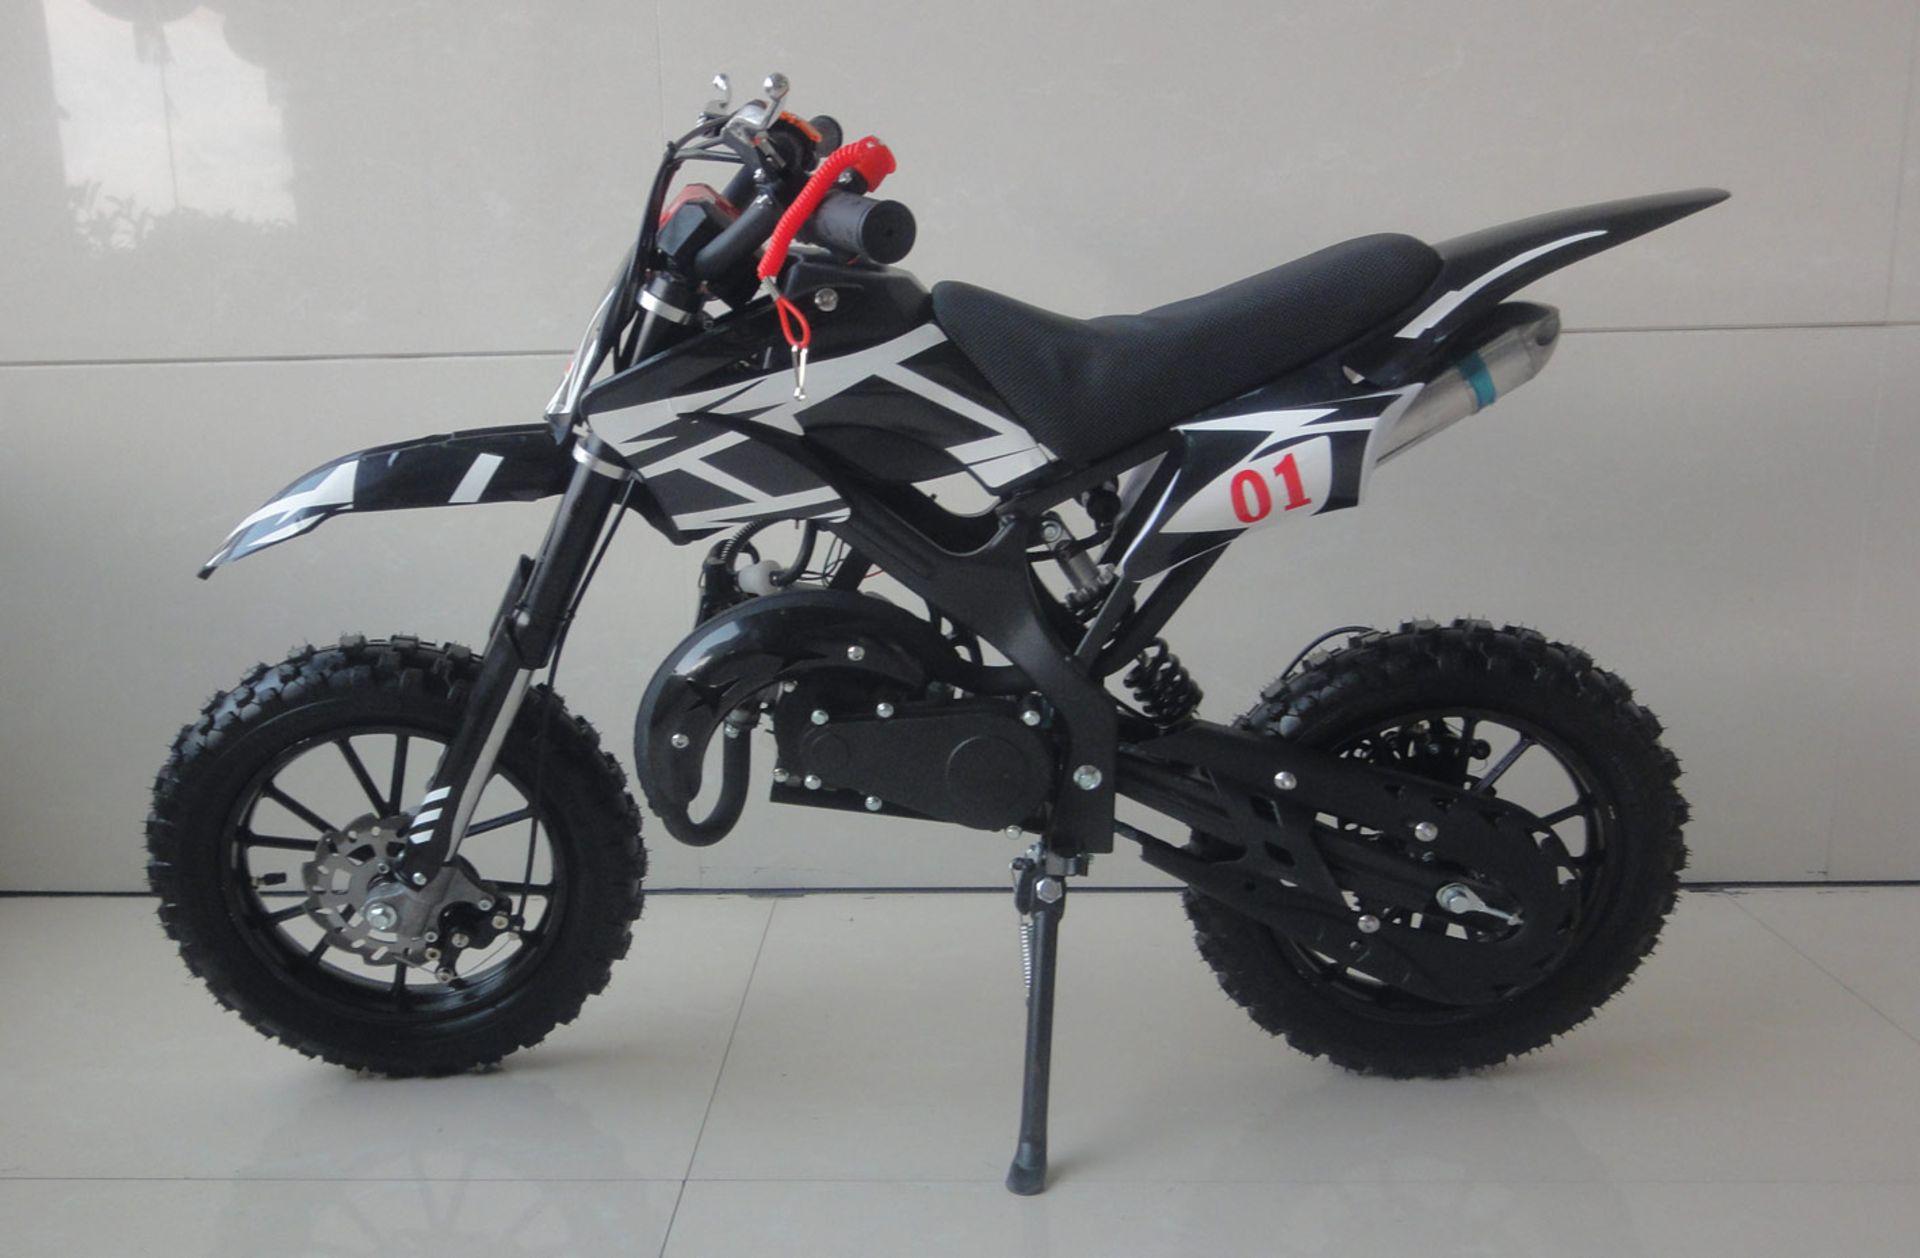 + VAT Brand New 49cc Falcon Mini Dirt Bike - Full Front & Rear Suspension - Disc Brakes - Easy Pull - Image 6 of 6